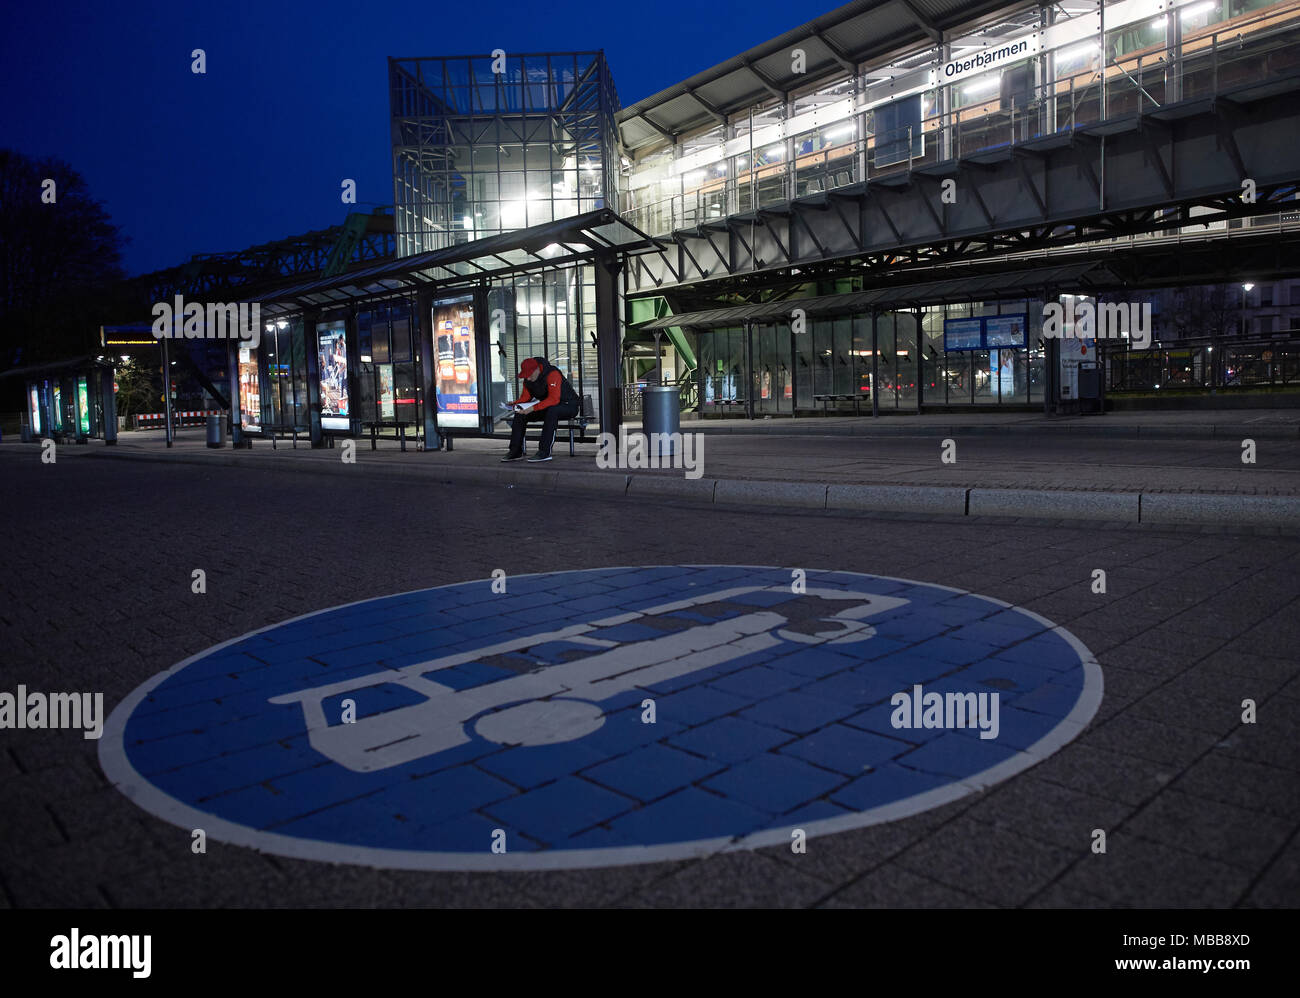 Dpatop 10 April 2018 Deutschland Wuppertal Ein Mann Wartet An